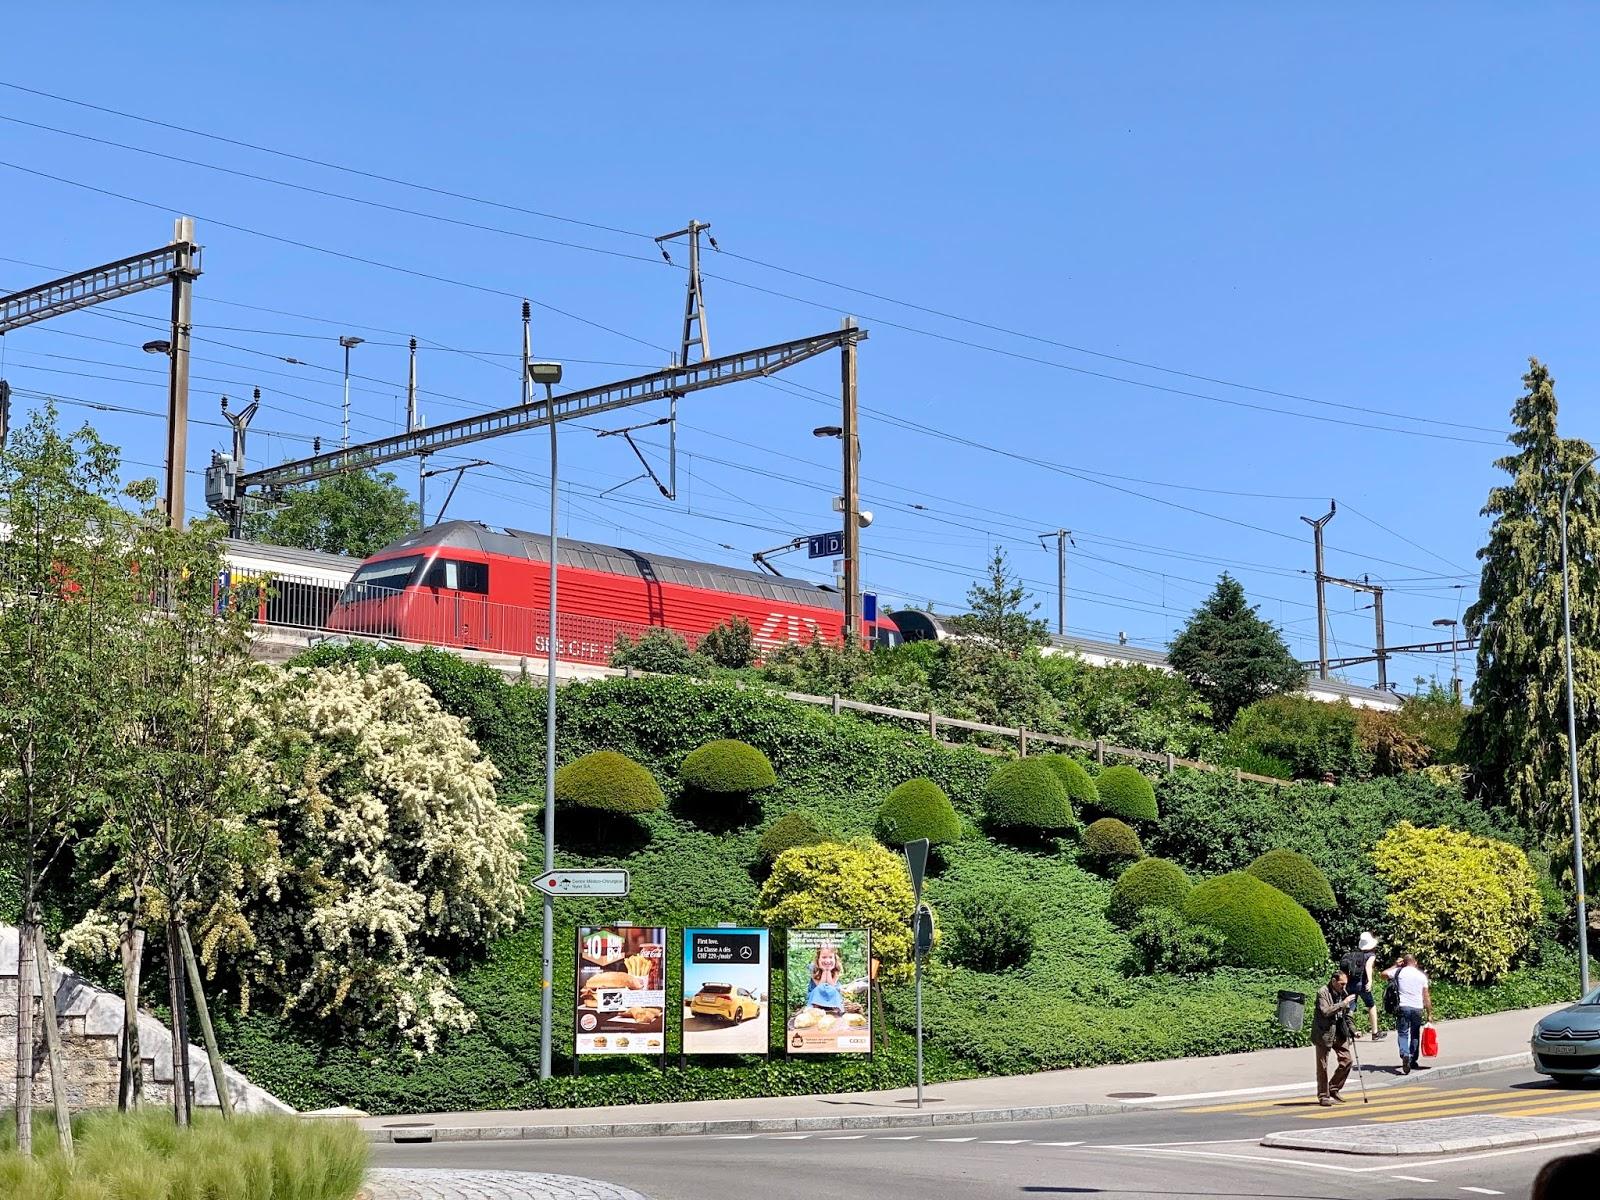 Nyon station